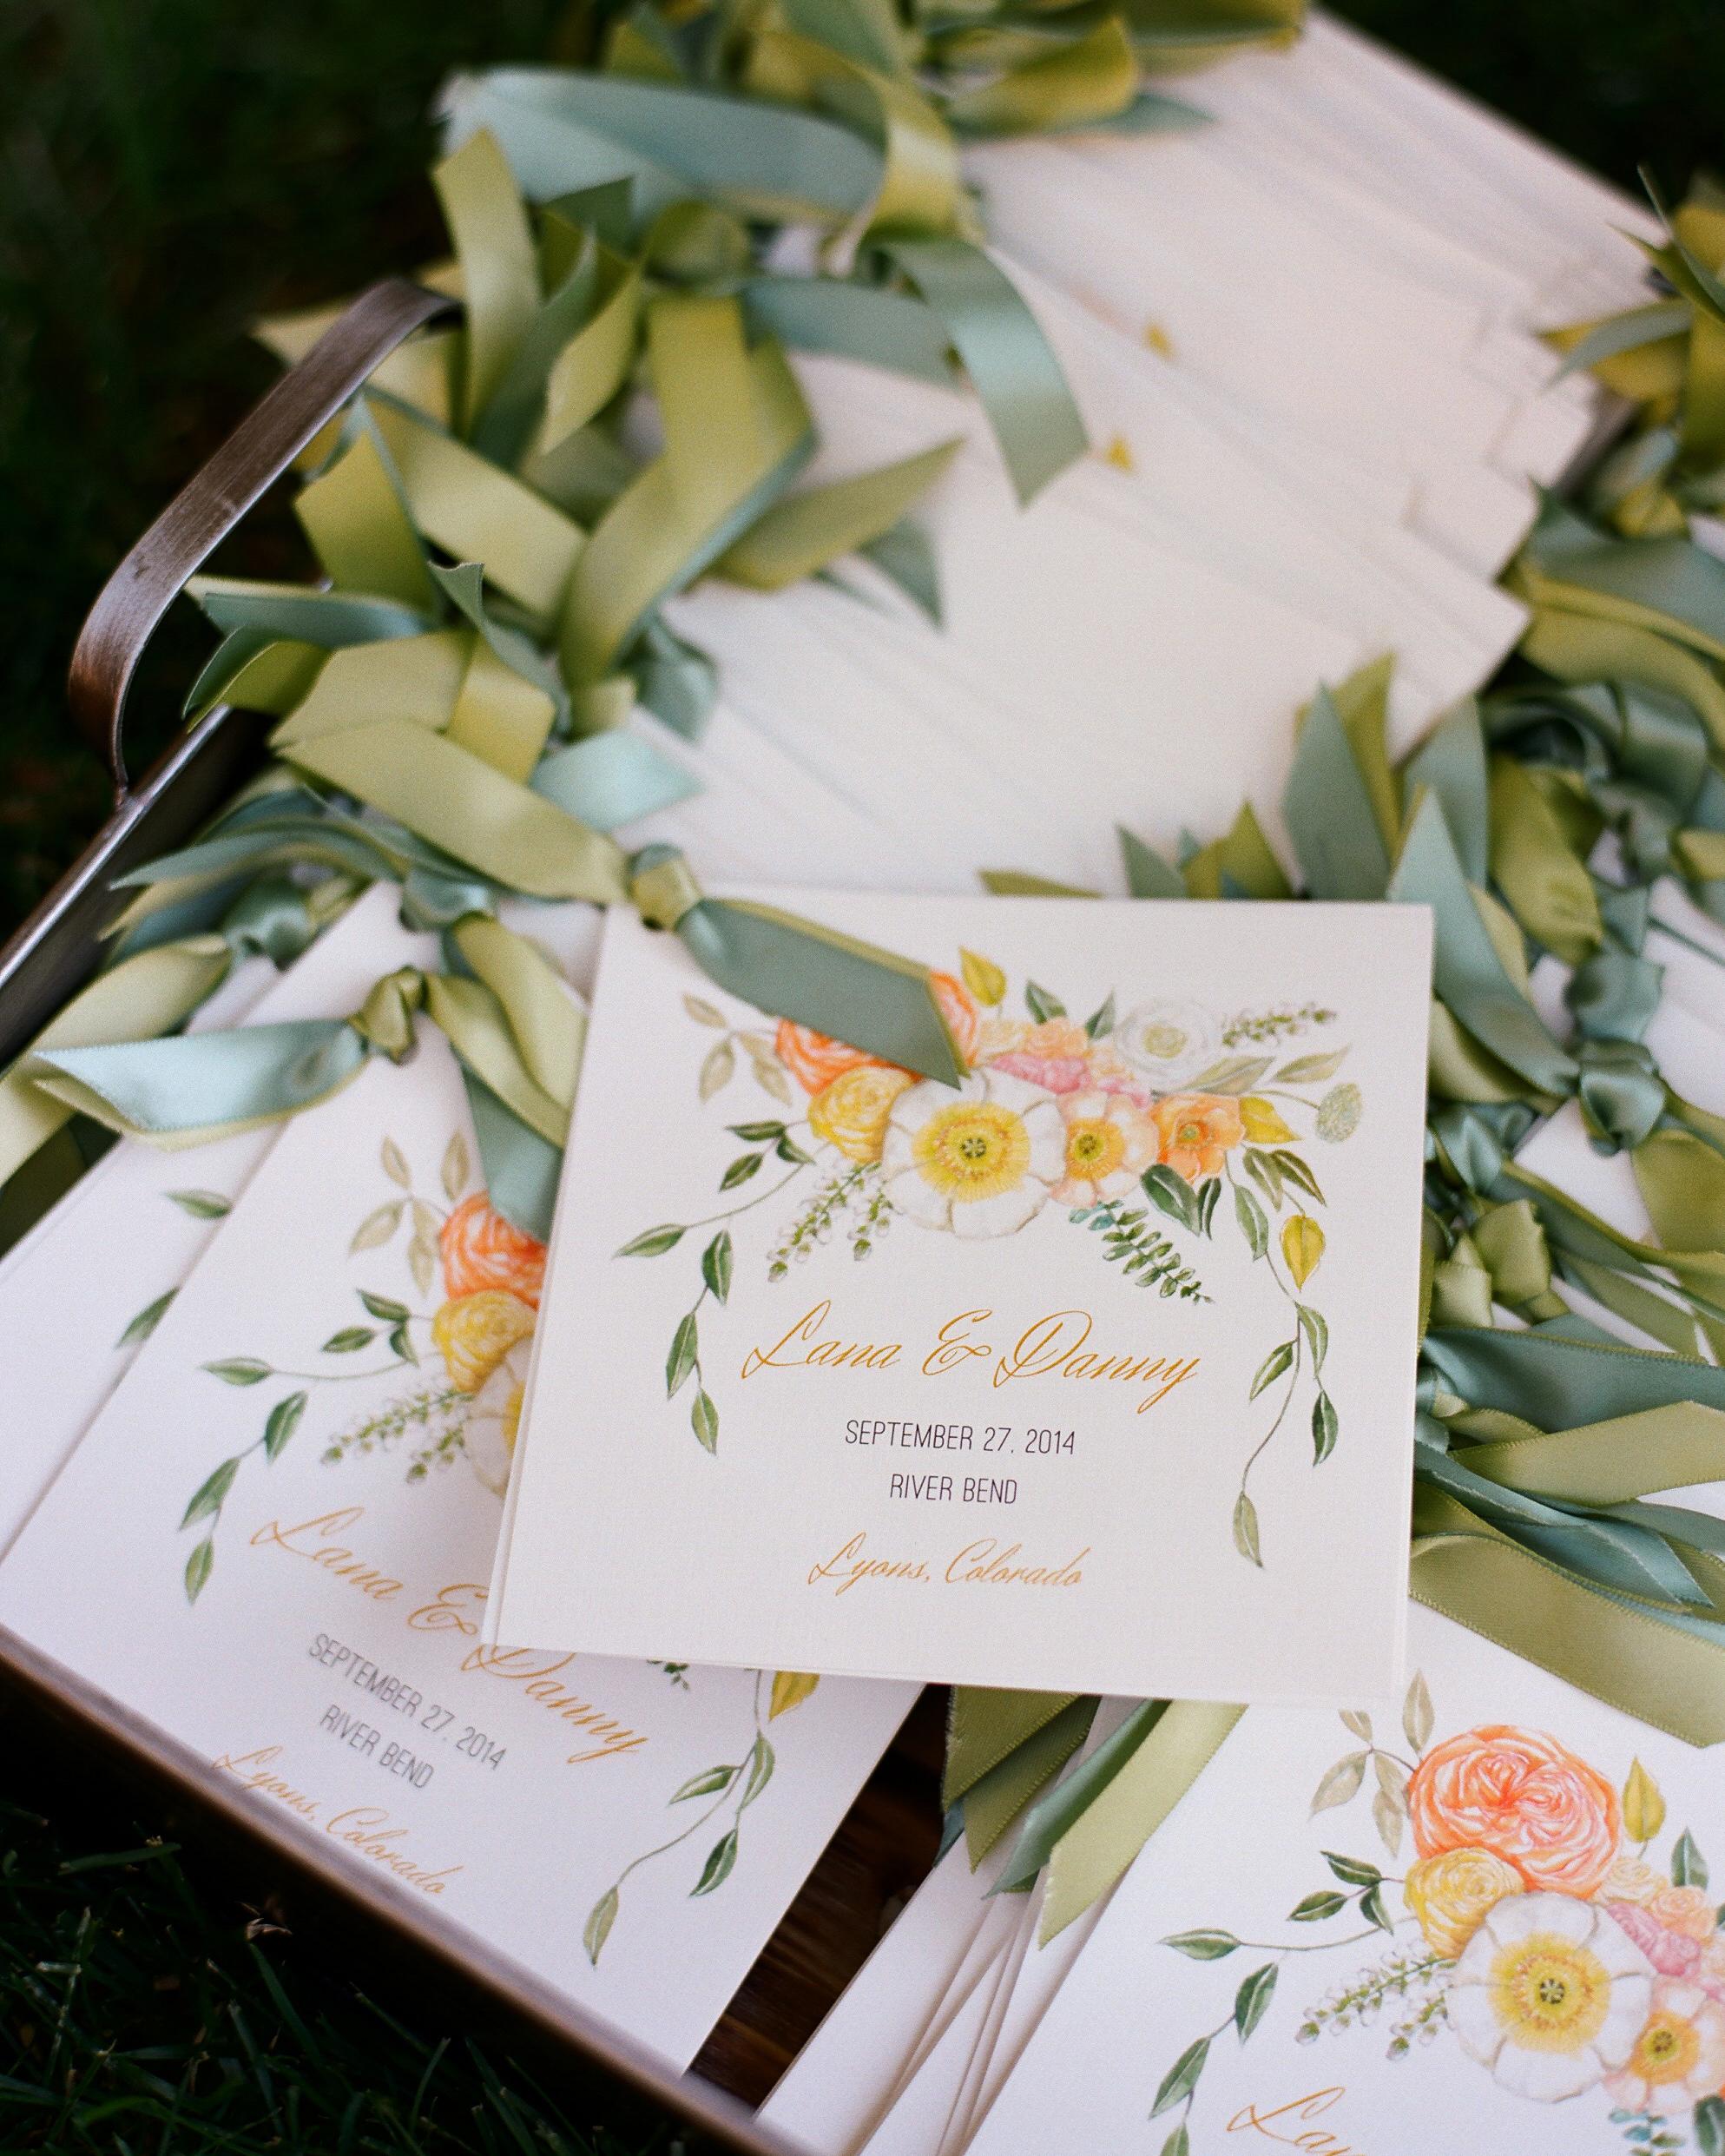 lana-danny-wedding-programs-329-s111831-0315.jpg